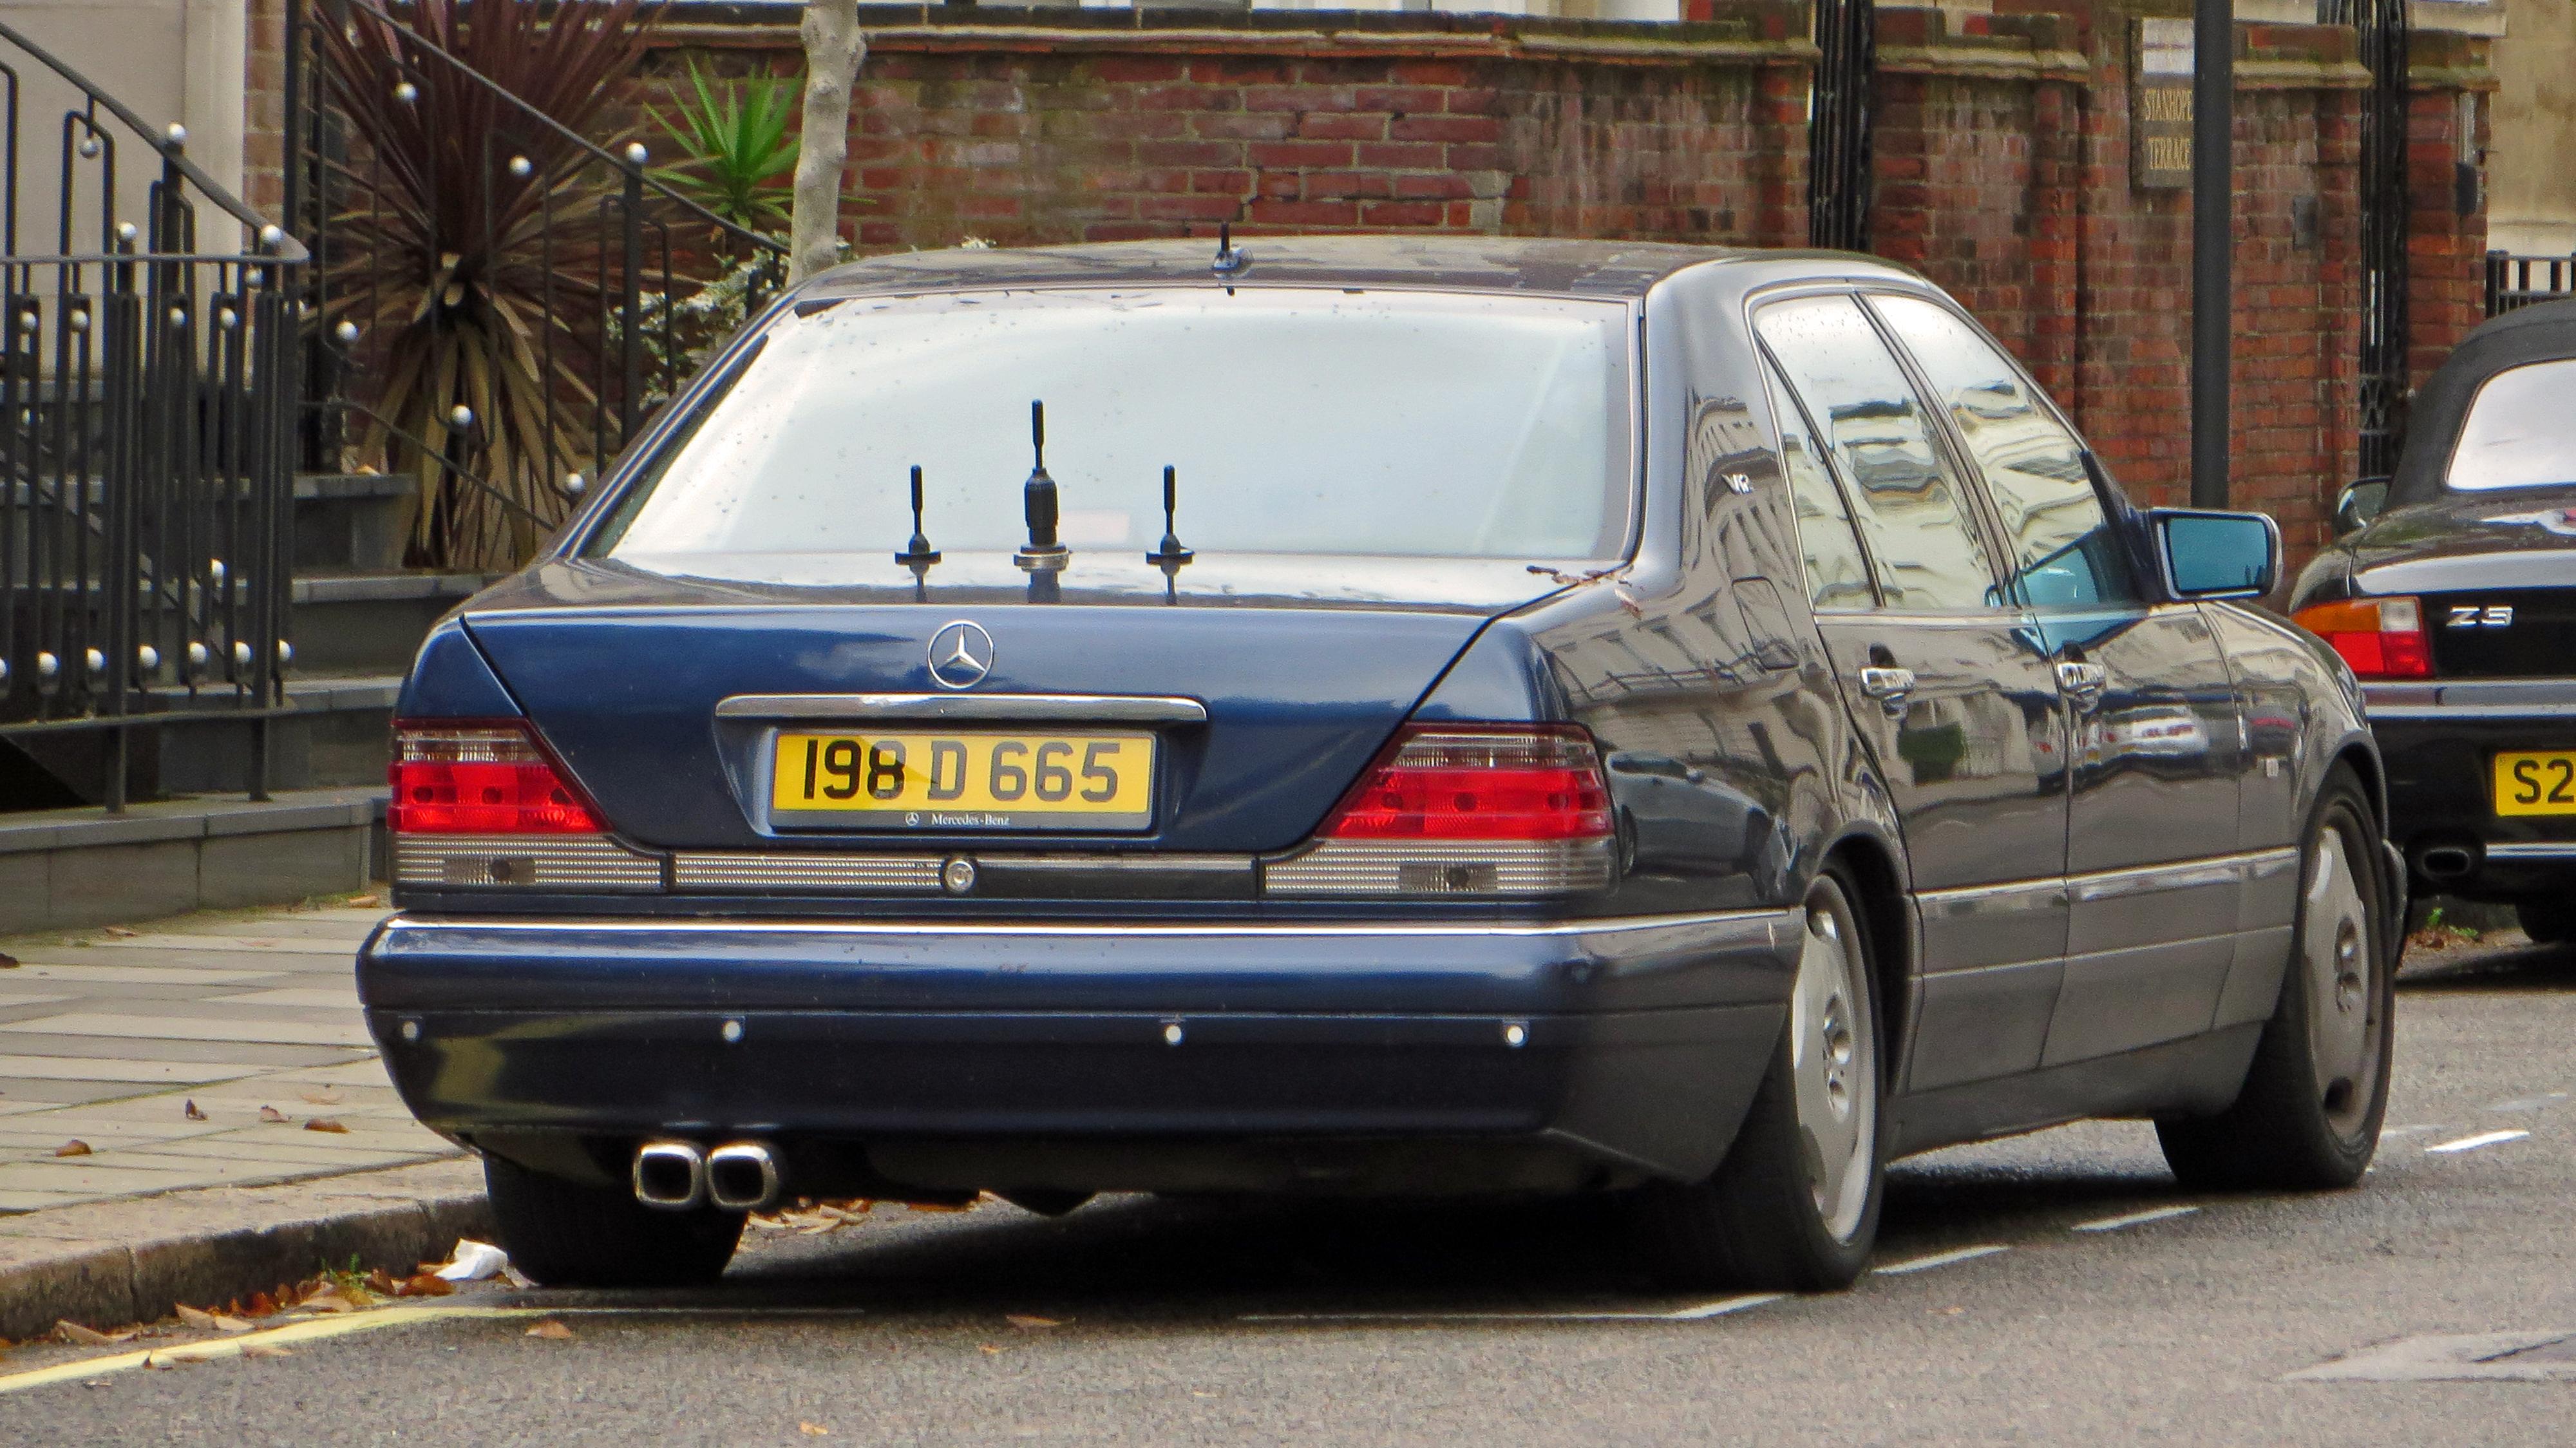 City of westminster london uk 1996 1998 mercedes benz for Mercedes benz westminster